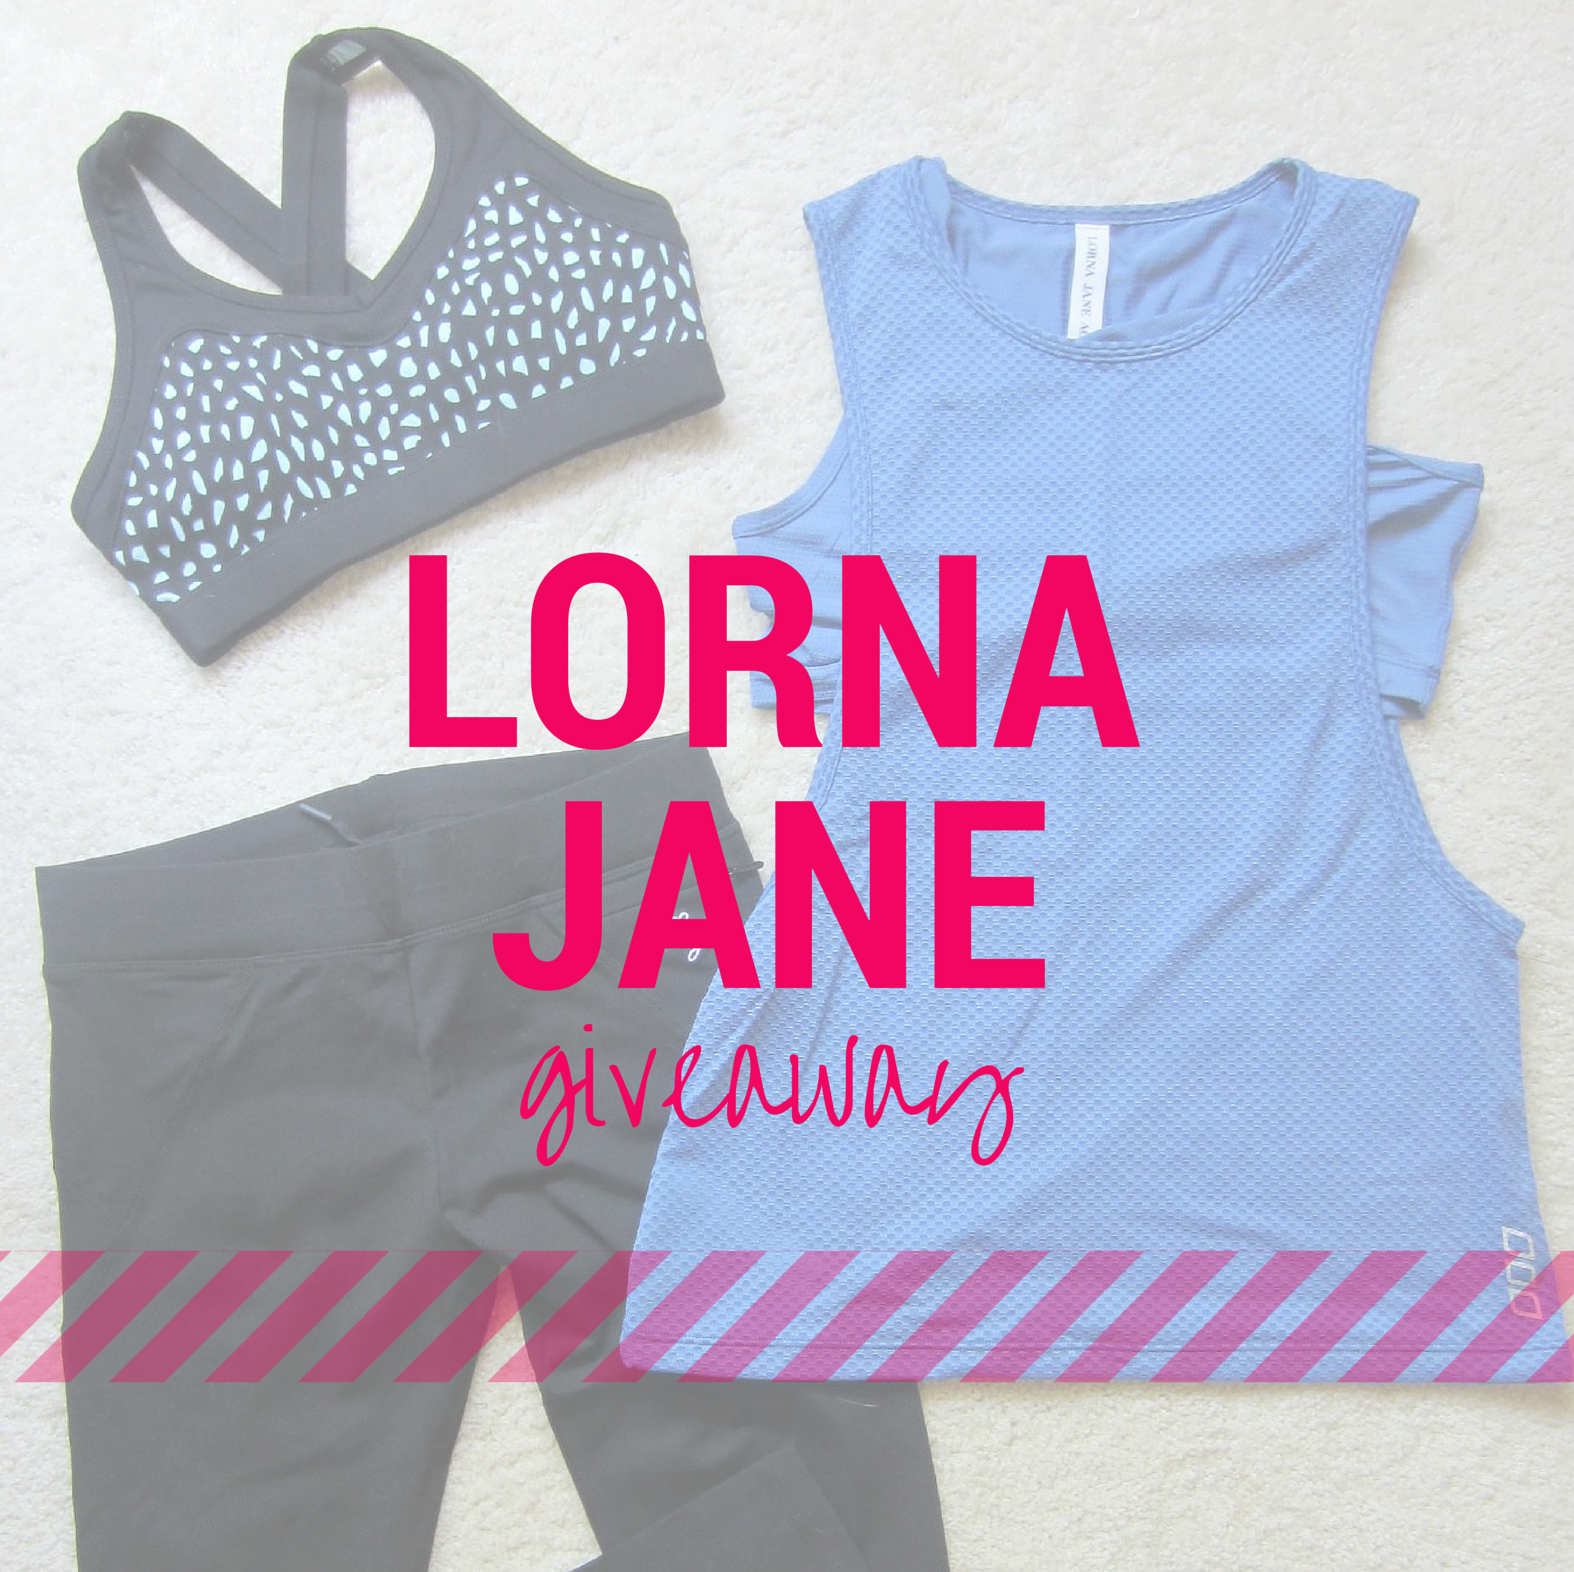 lorna jane giveaway